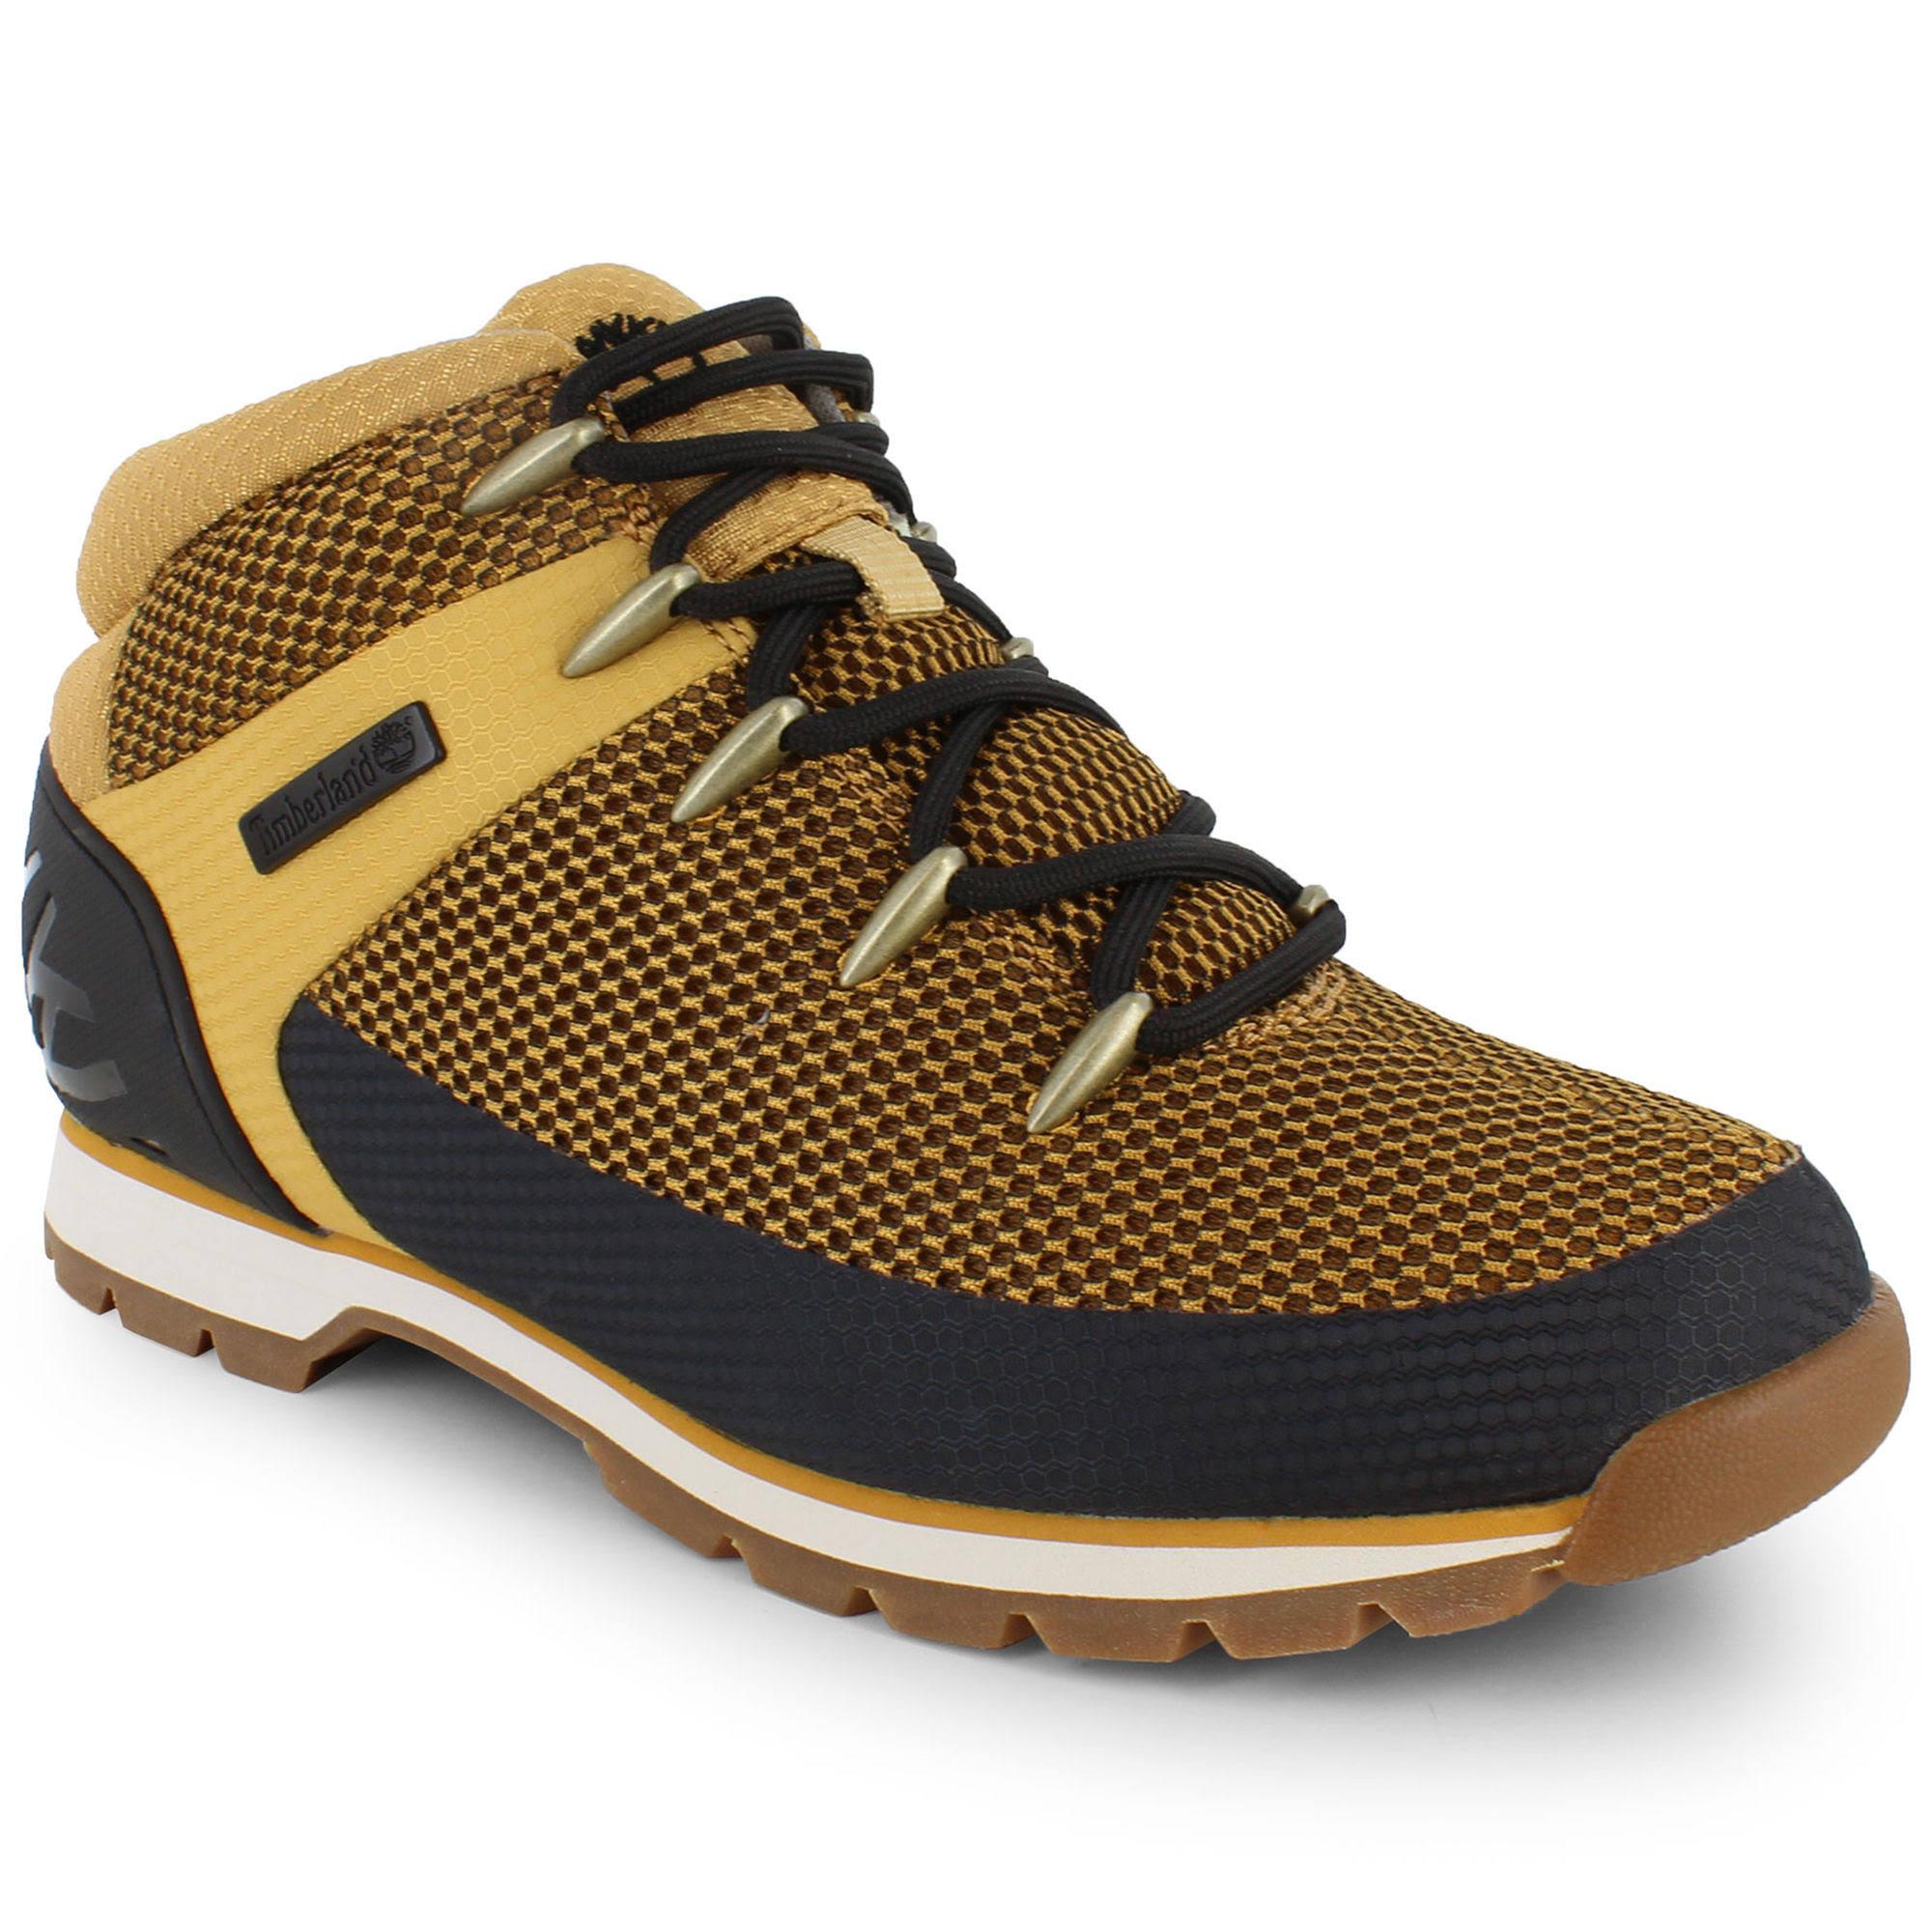 Sprint Boots Sintético De M Trigo Timberland 10 Hombre 5 Euro Malla 1qgg4f